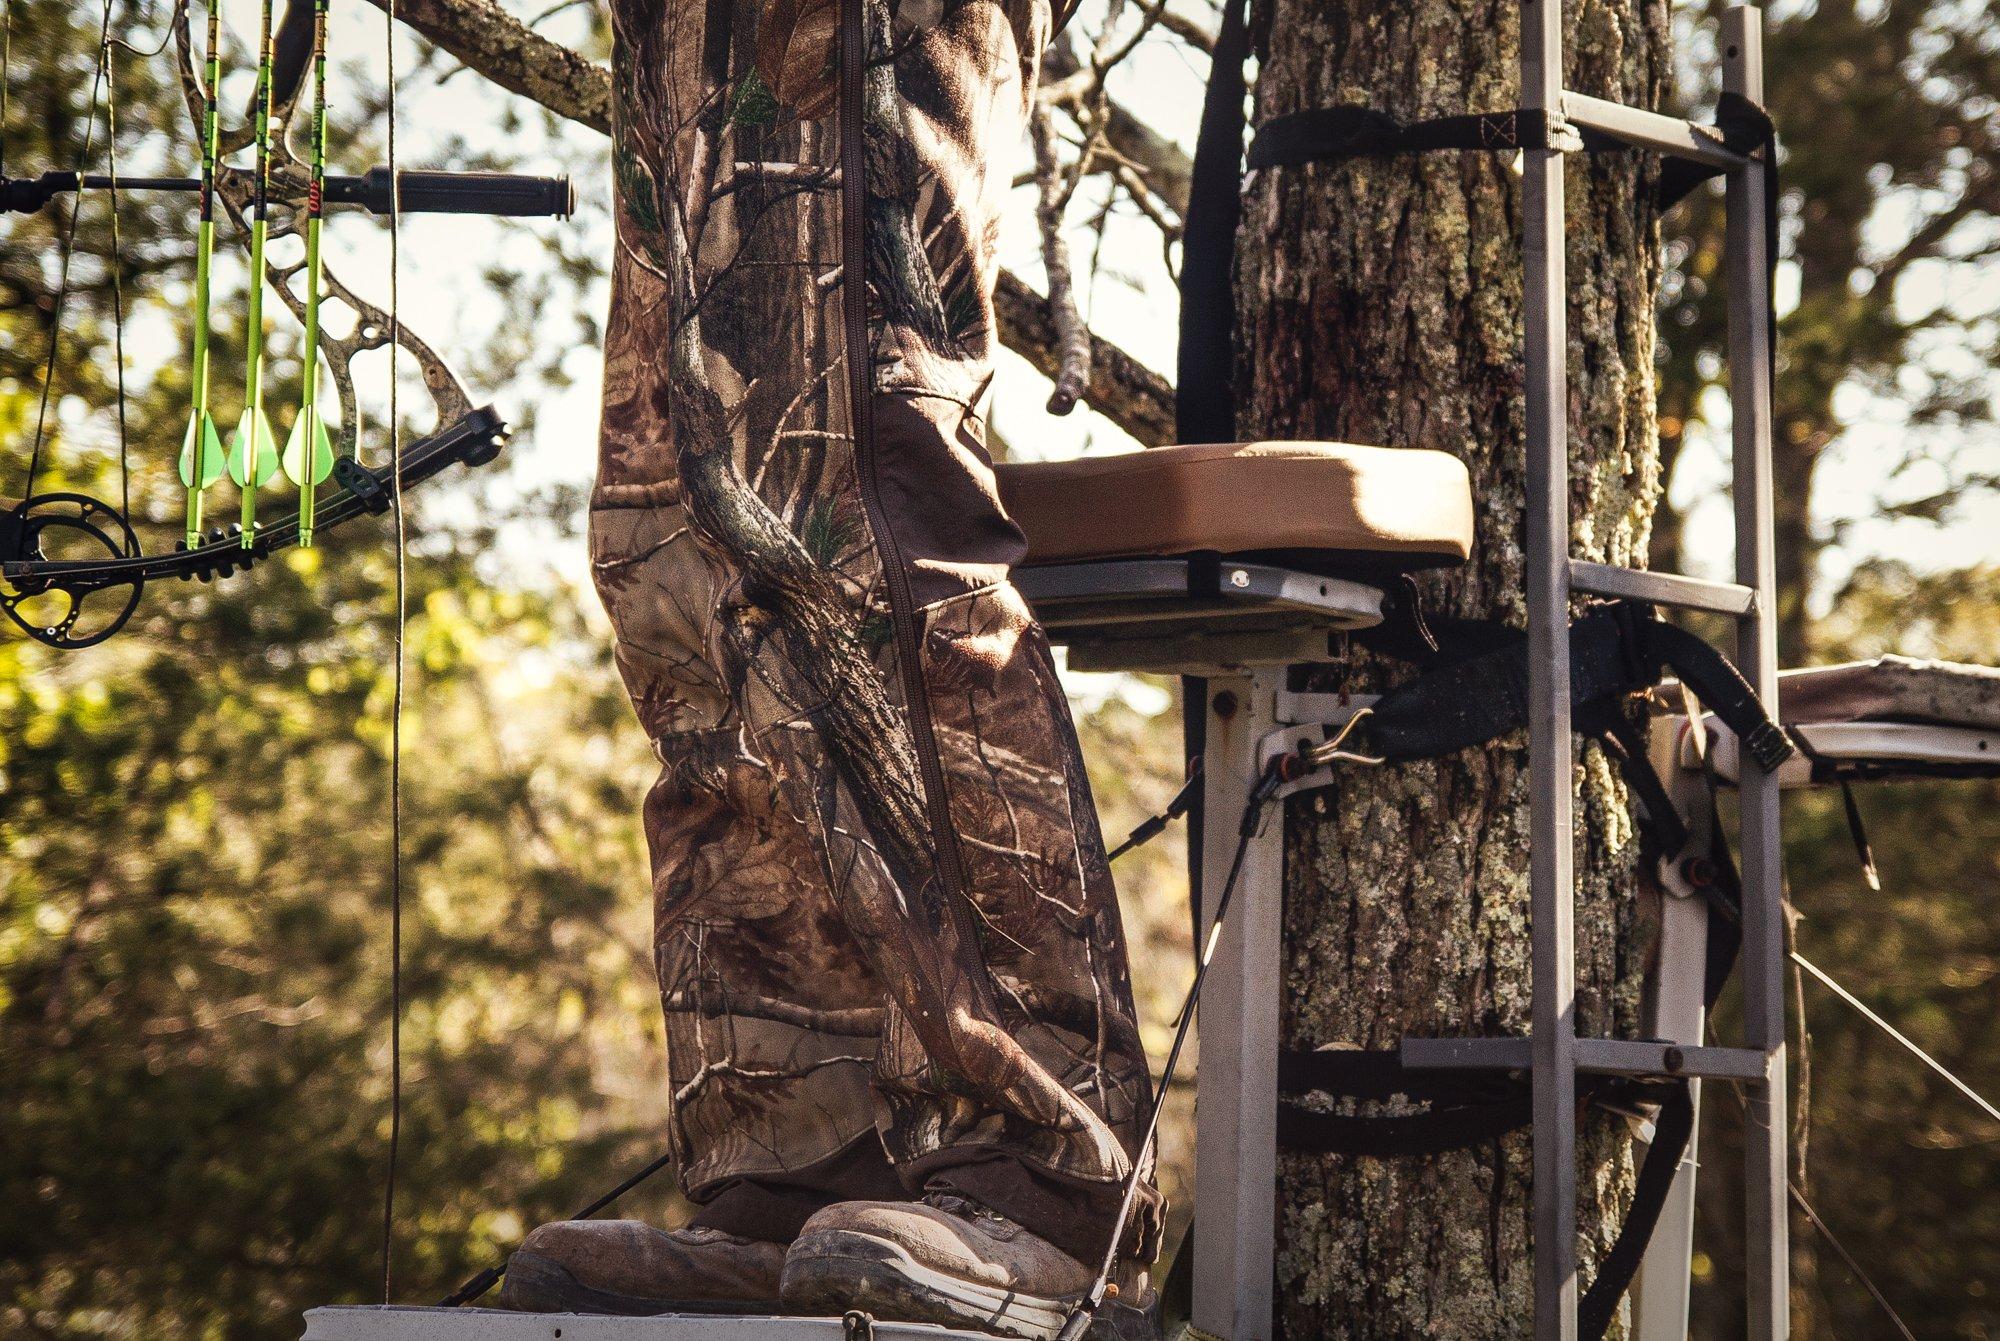 Hunt Comfort Hiker GelCore Hunting Seat, Coyote Brown by Hunt Comfort (Image #5)